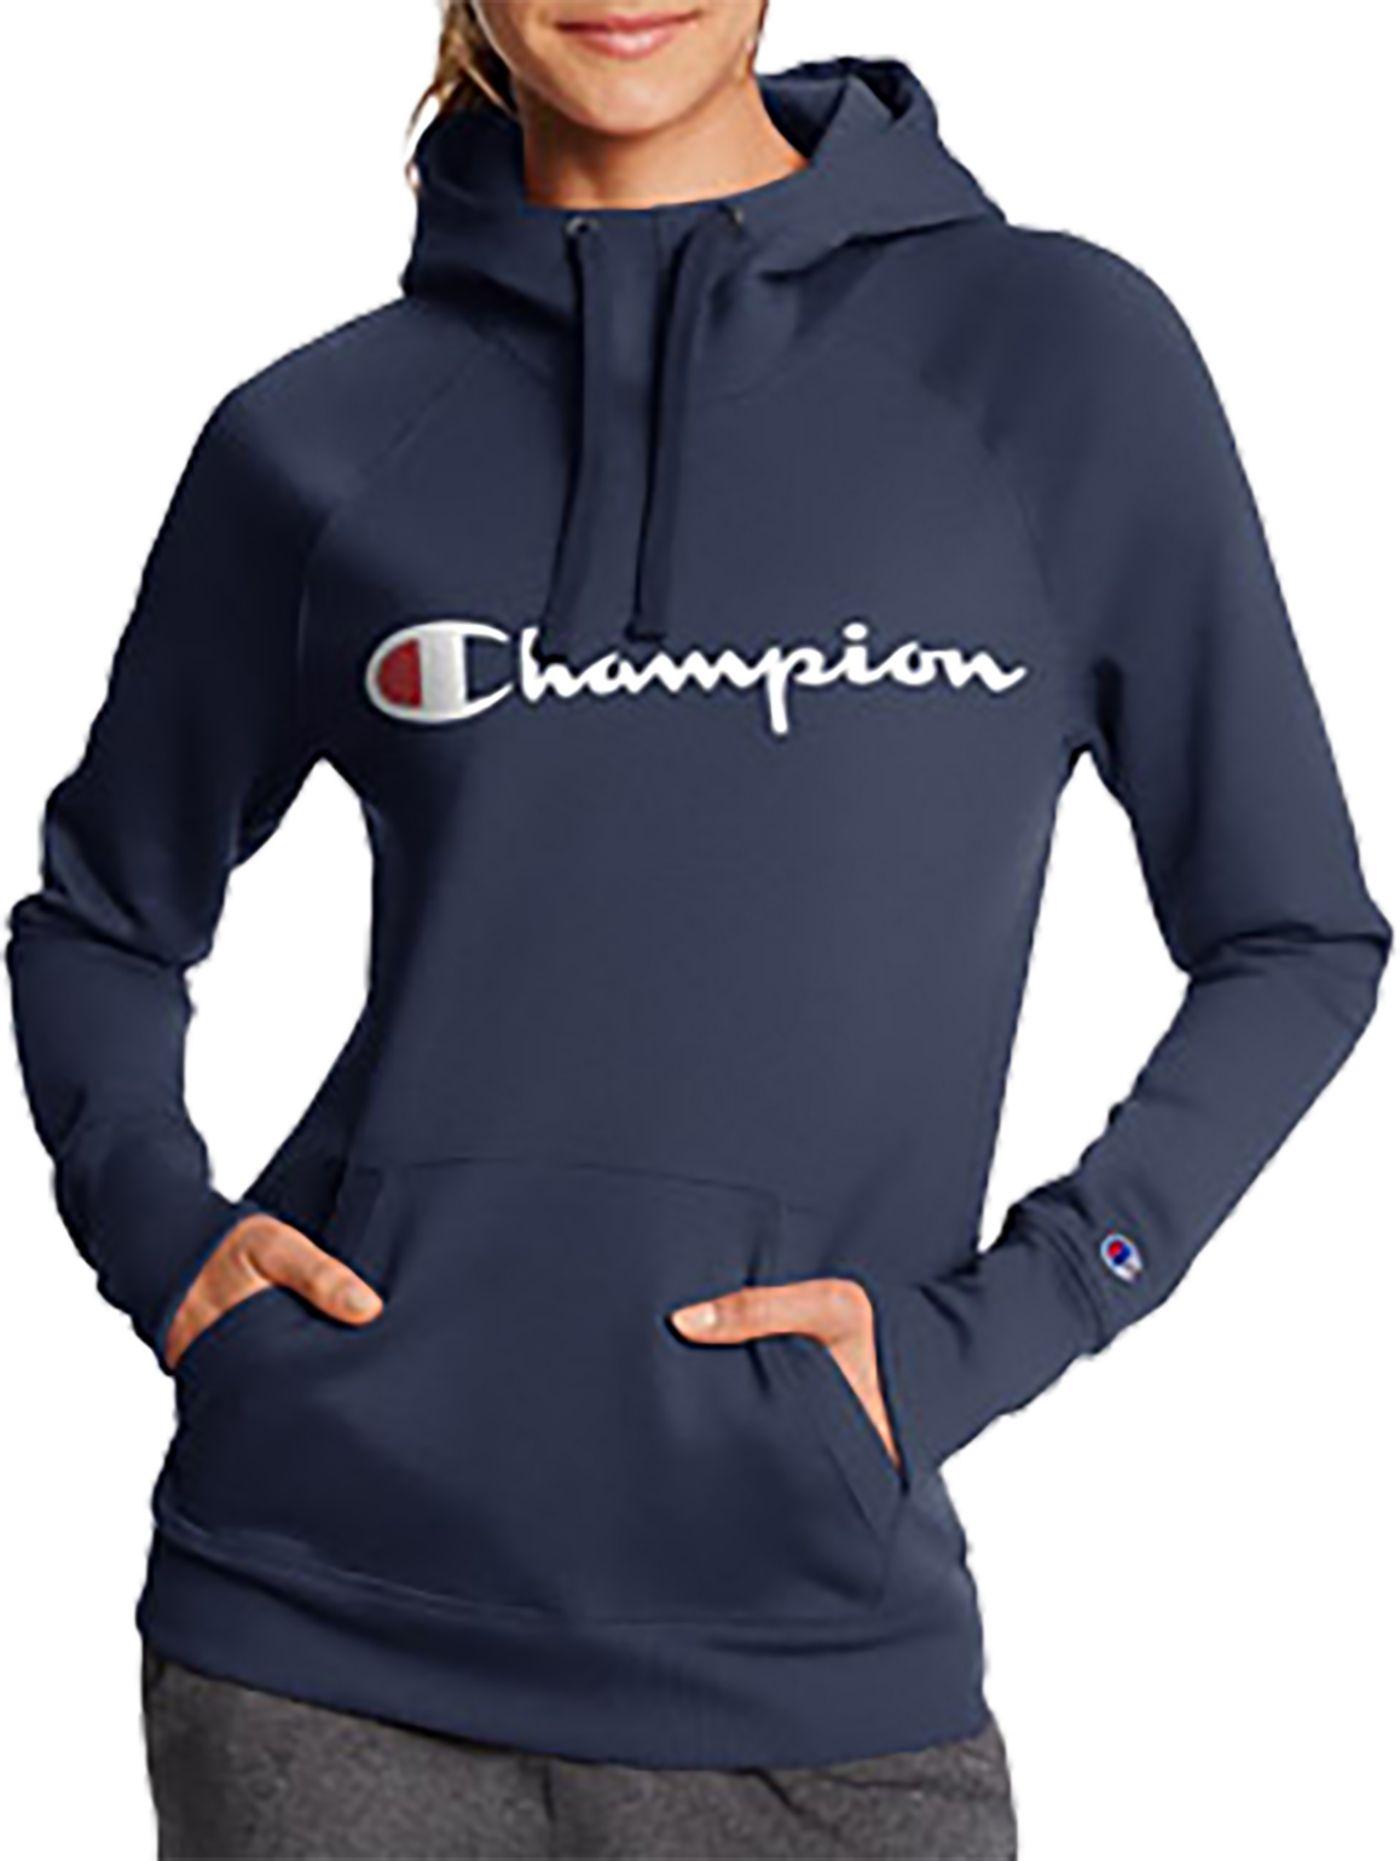 Champion Women's Powerblend Logo Pullover Hoodie